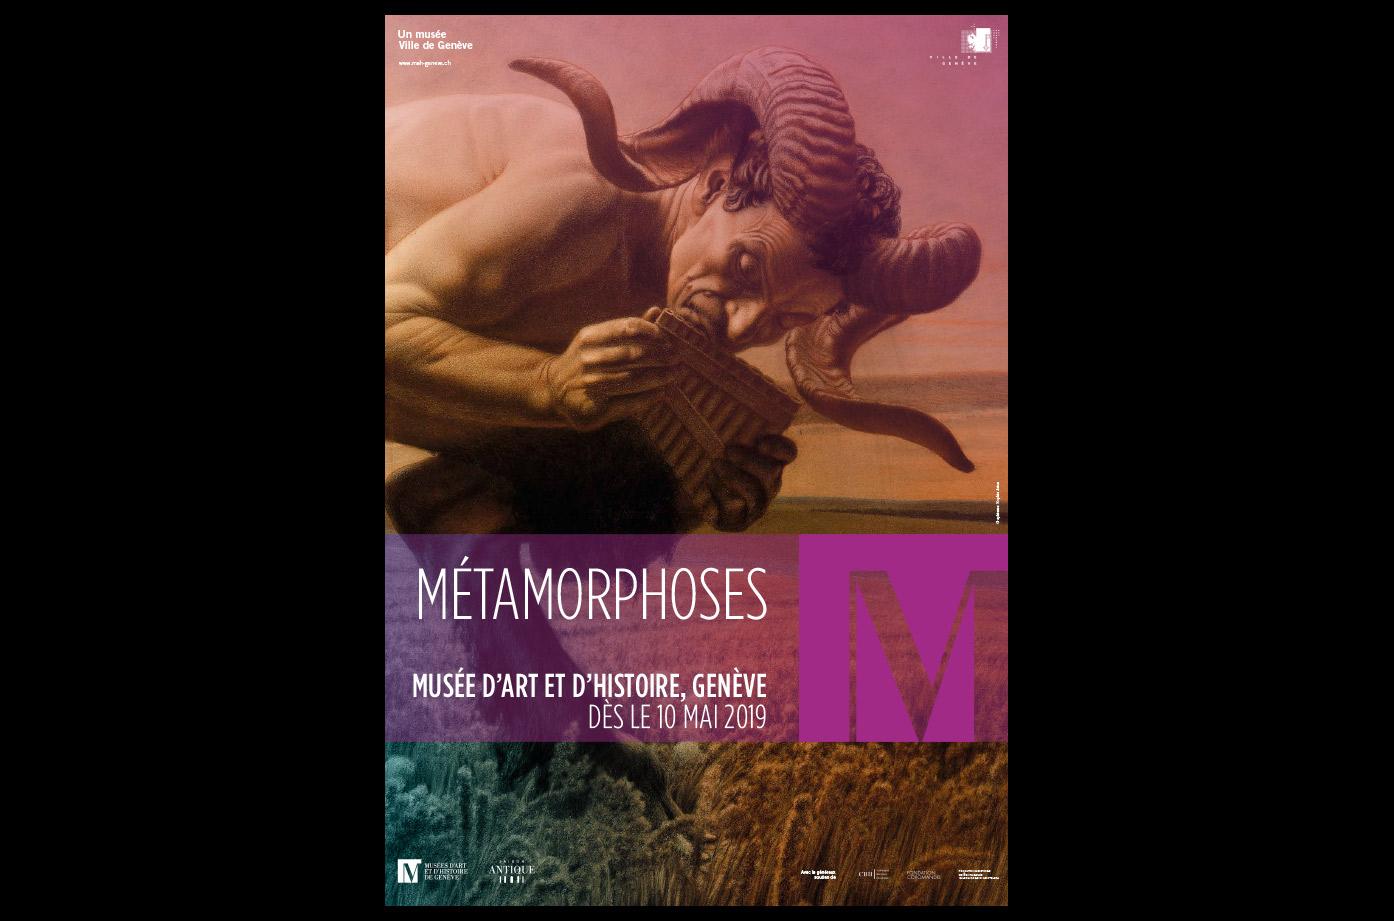 Musee-Art-Histoire-Exposition-Metamorphoses-Affiche-Sophie-Jaton